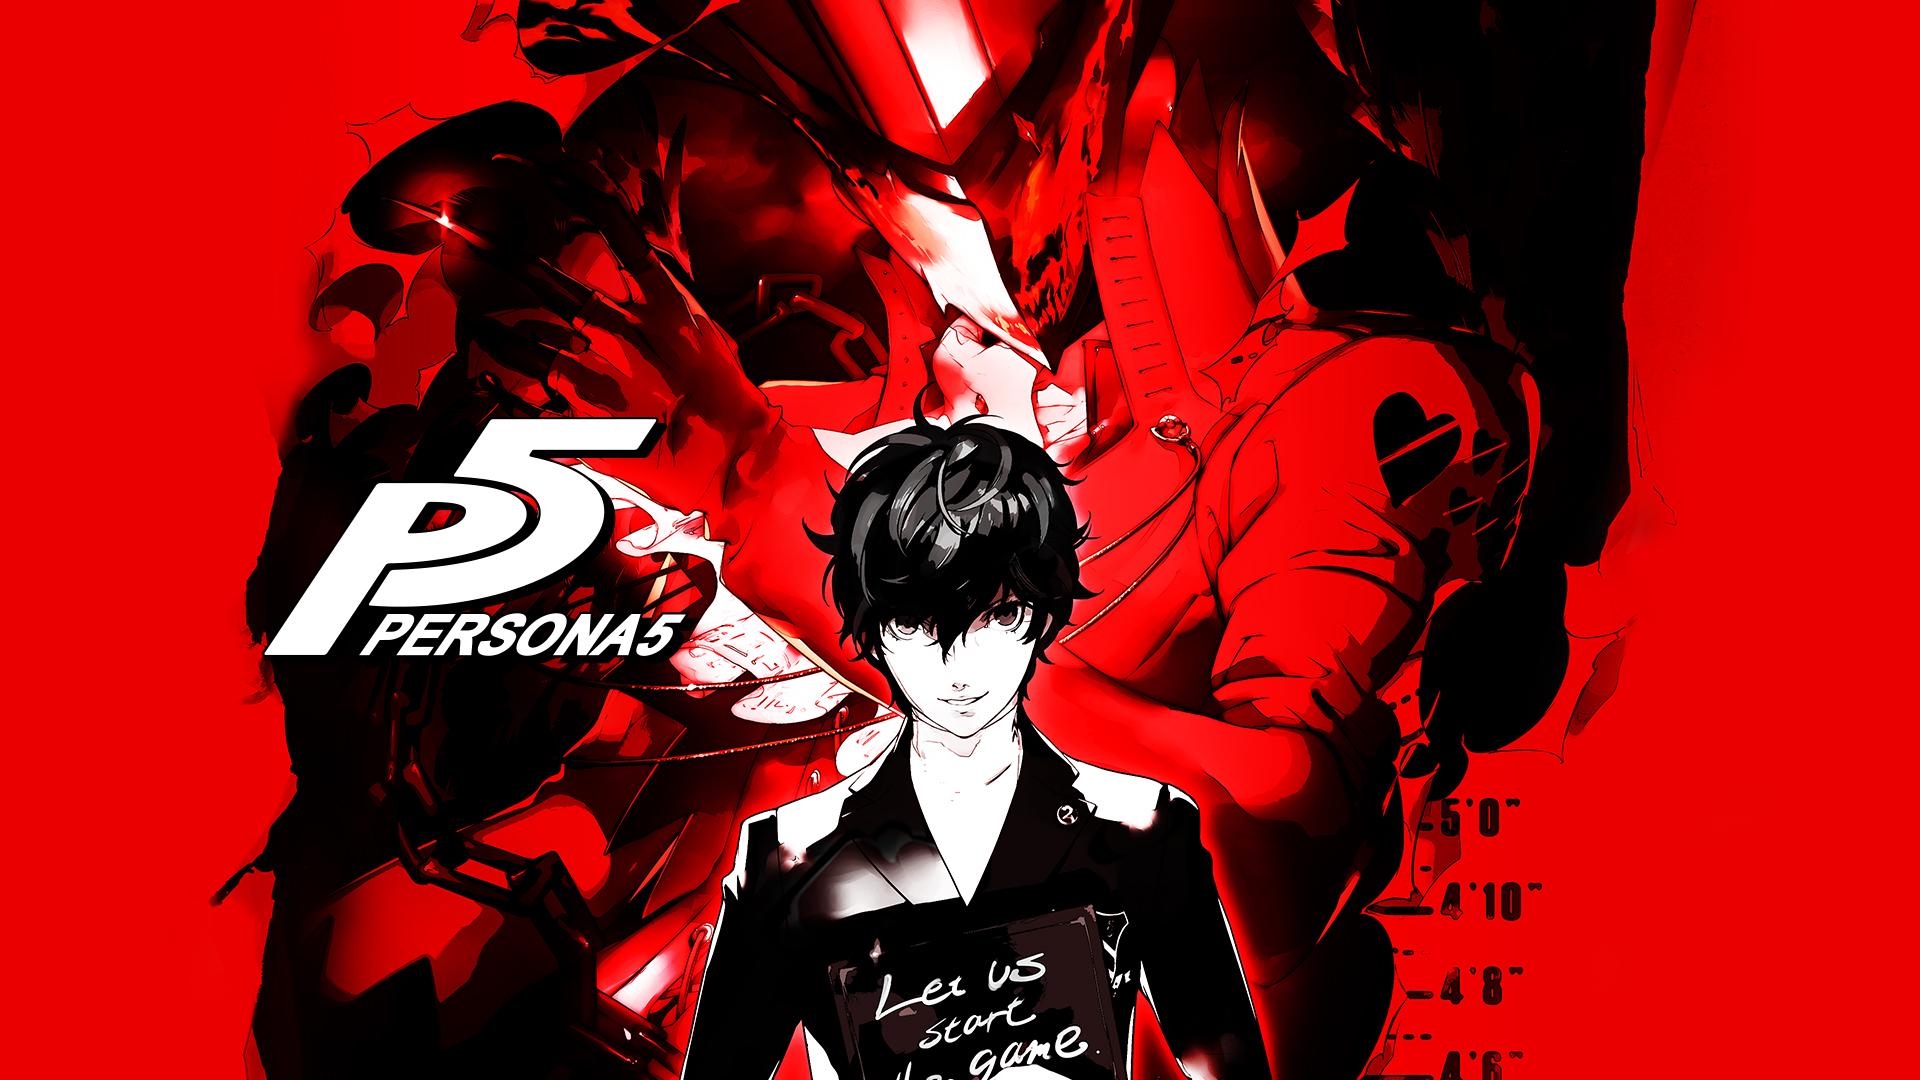 Persona 5 (Atlus games, 2017)